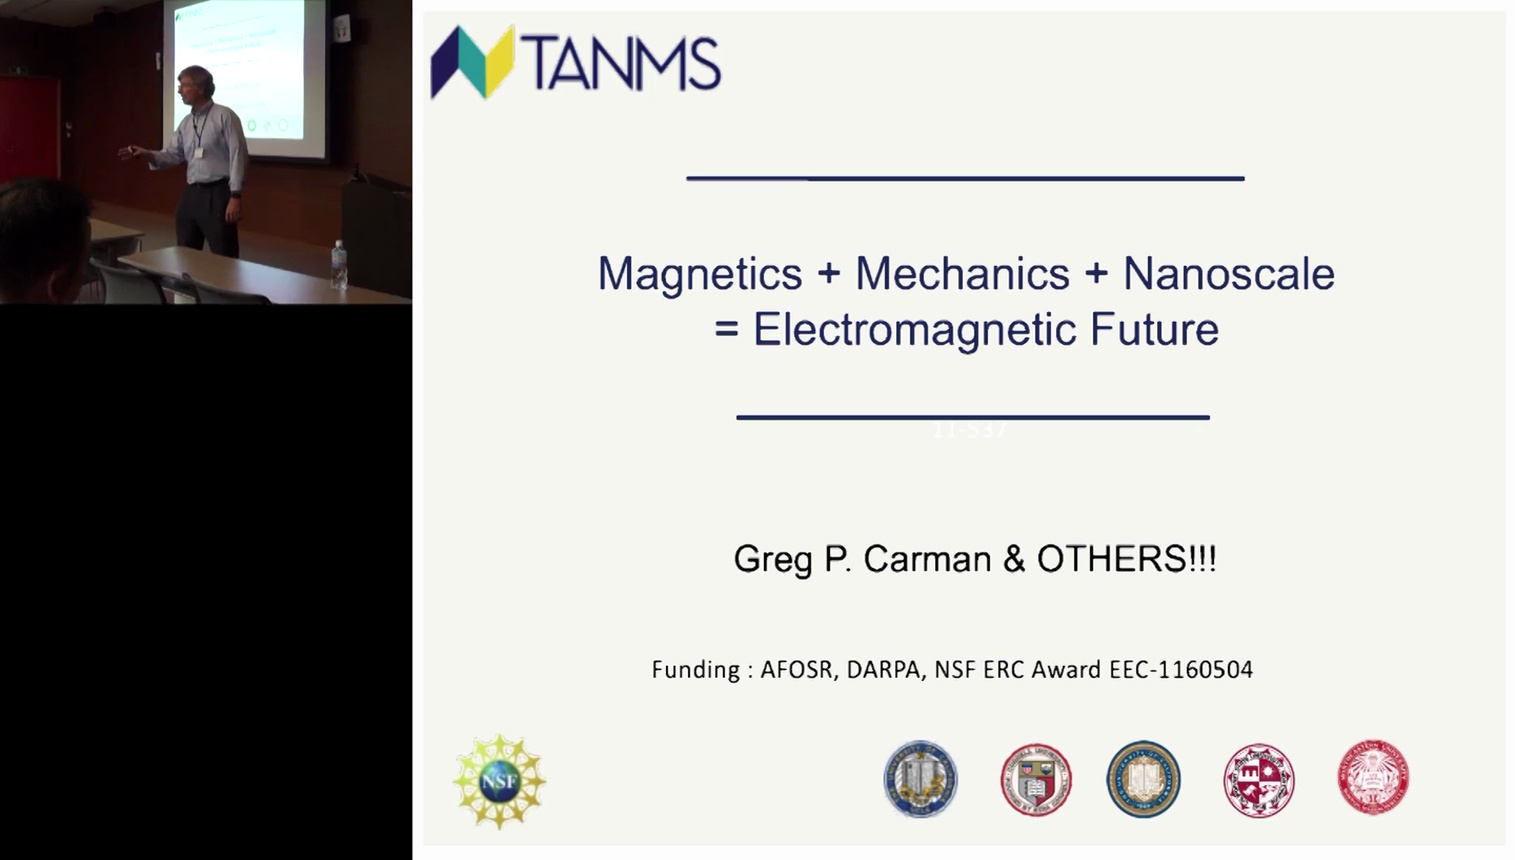 Magnetics + Mechanics + Nanoscale = Electromagnetics Future - Greg P. Carman: IEEE Magnetics Distinguished Lecture 2016